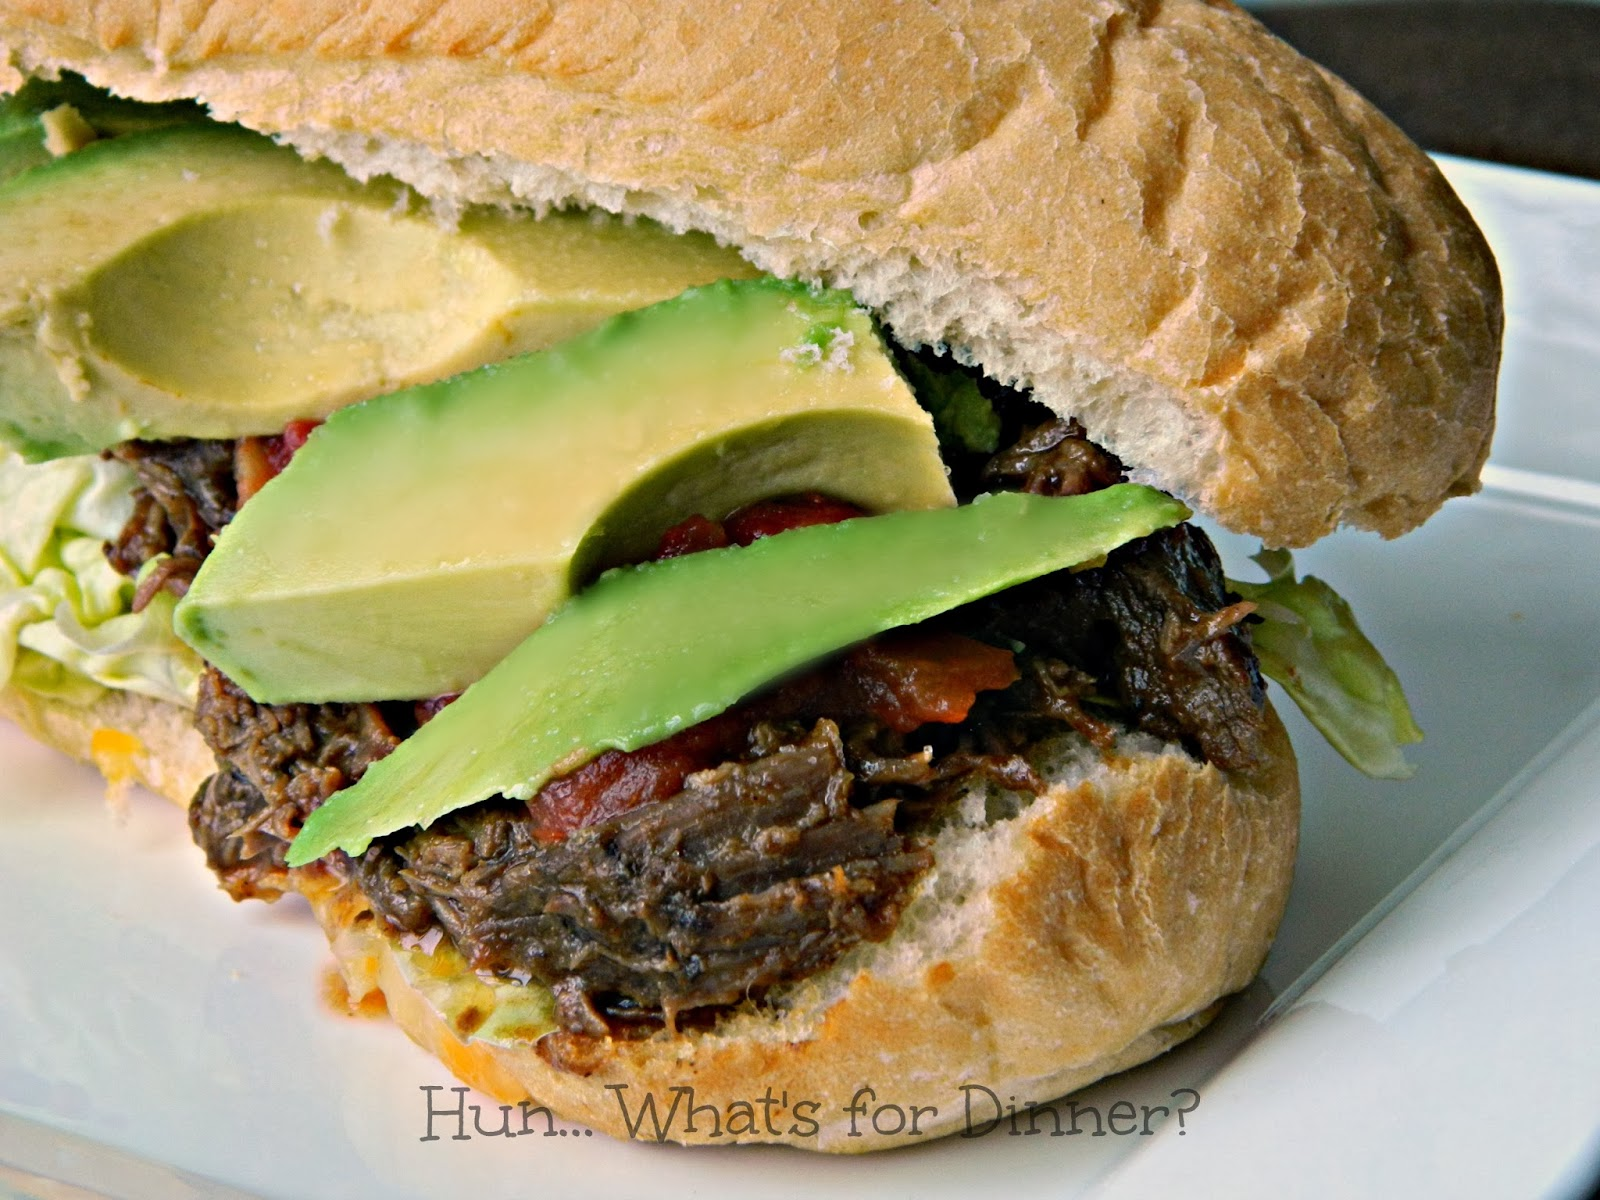 Slow Cooker Tex Mex BBQ Beef- www.hunwhatsfordinner.com